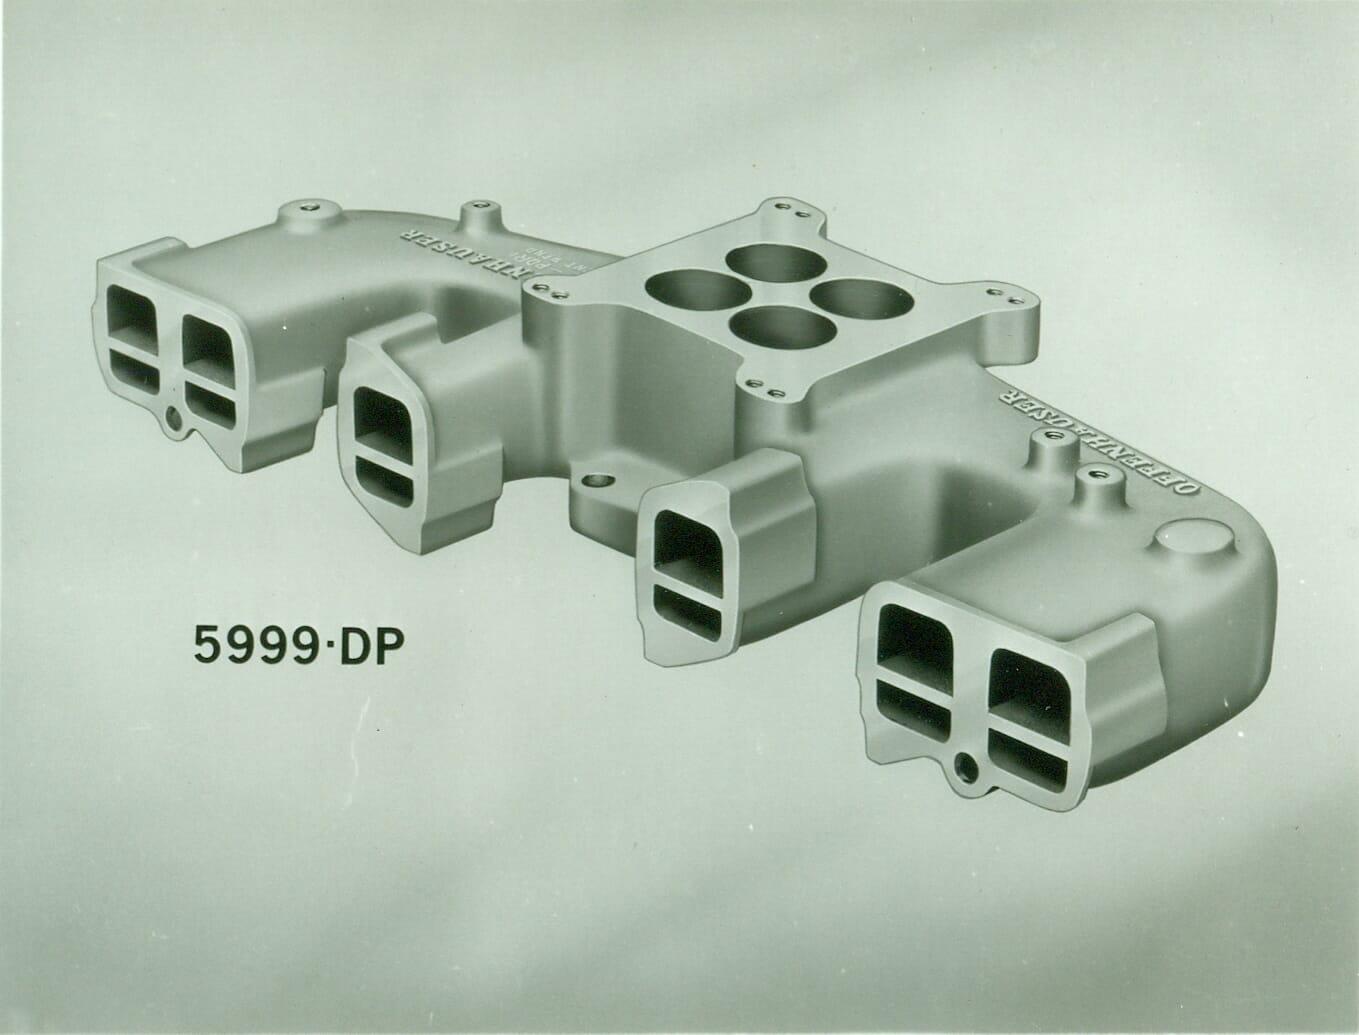 Offenhauser Dual Port American Motors, Jeep, 6 Cylinder Manifold Thru '81 - std Bore 4 bbl